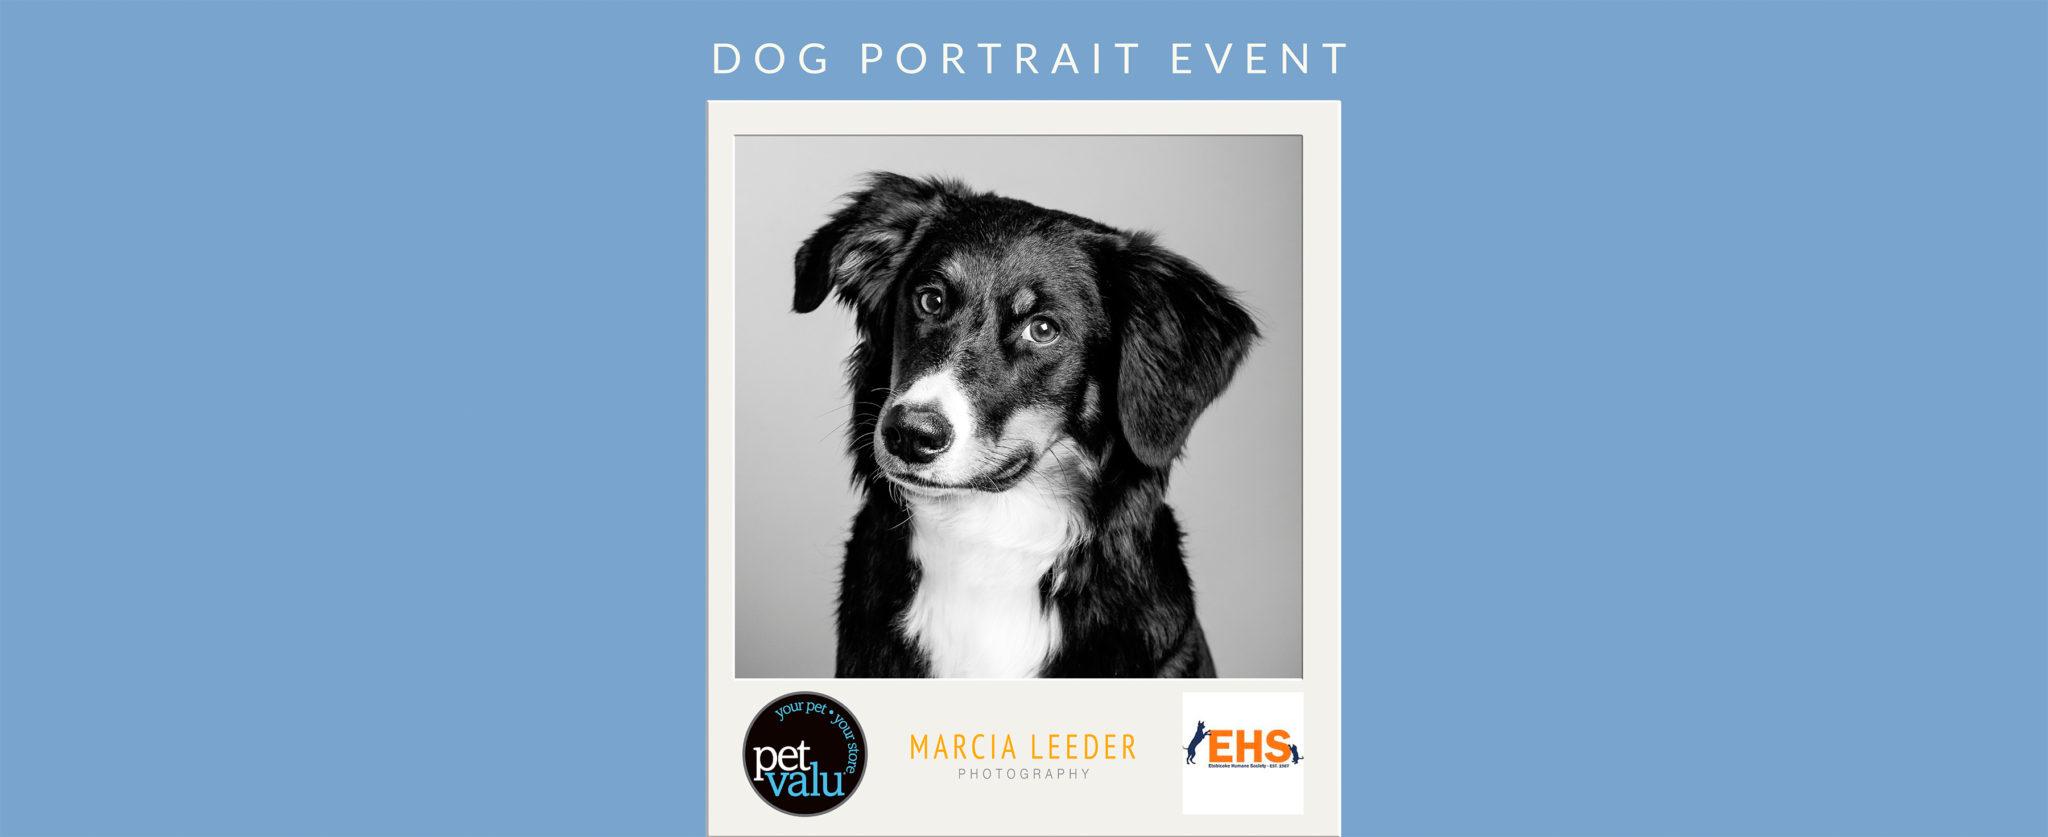 <a href='http://marcialeeder.com/2017/09/06/pet-valu-humber-bay-portrait-event/'></a>